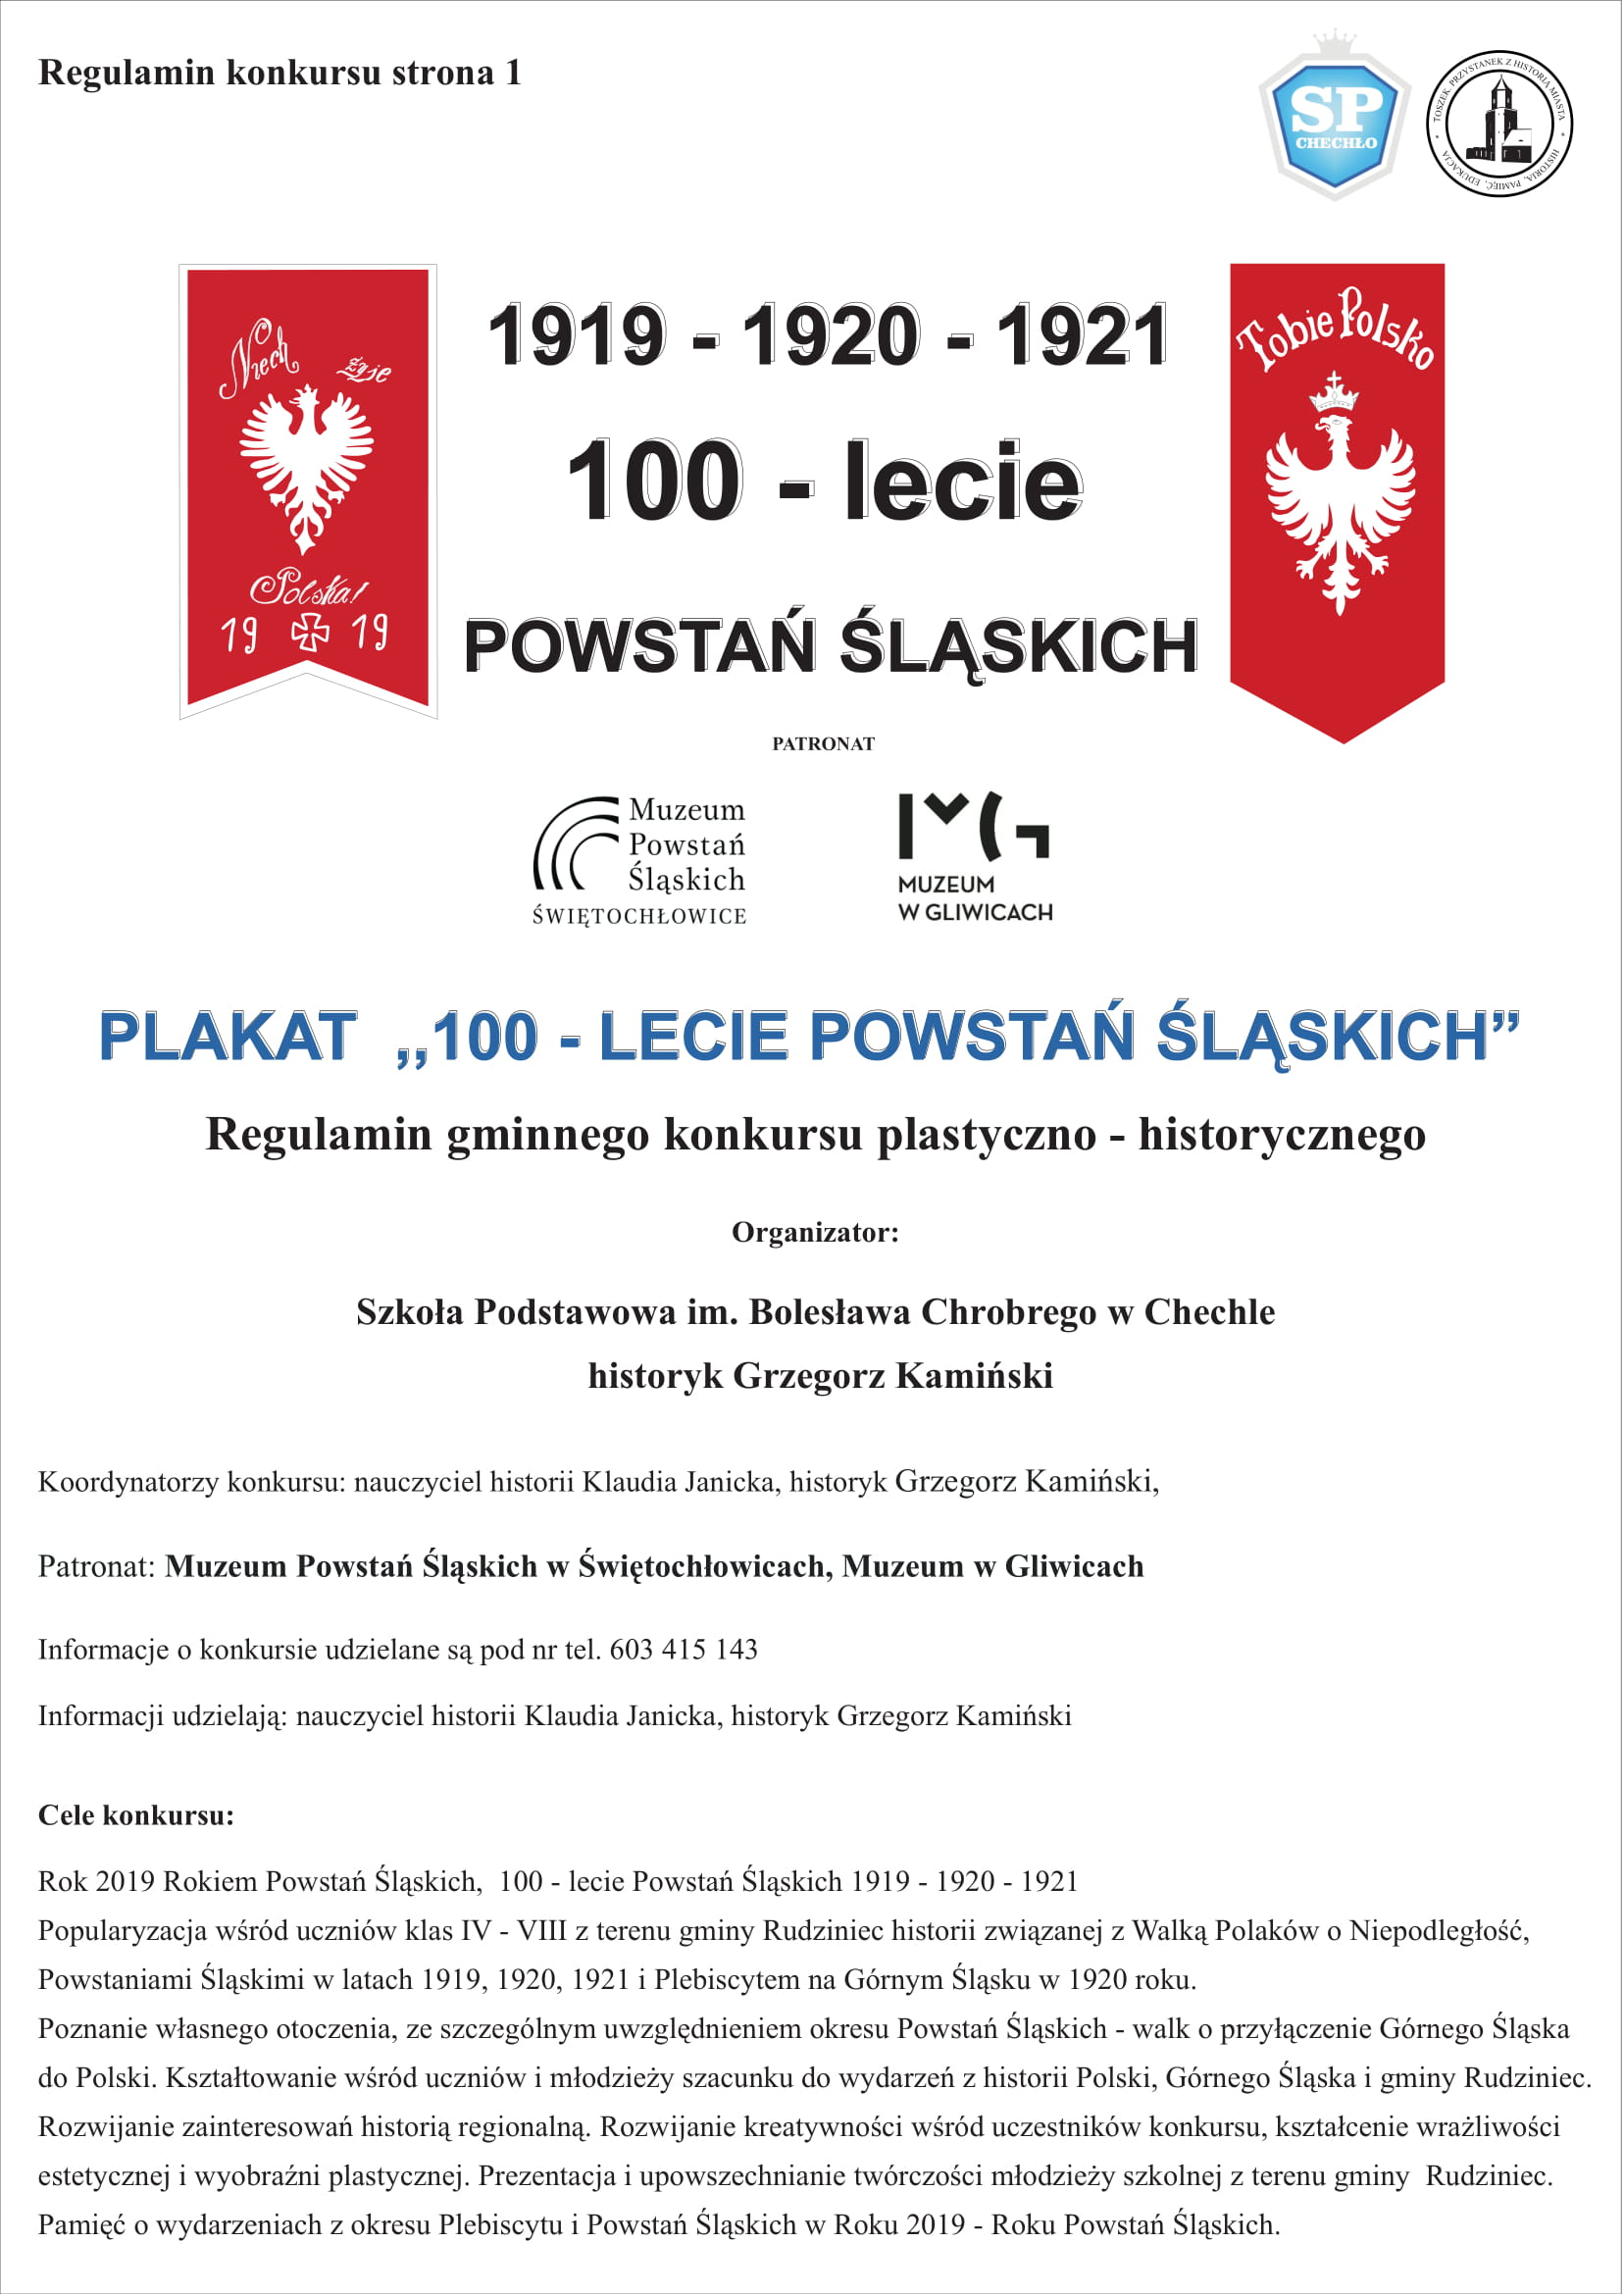 SP Chechlo Regulamin Szkolnego Konkursu Plakat na 100 lecie Powstan Slaskich 2019-1-1